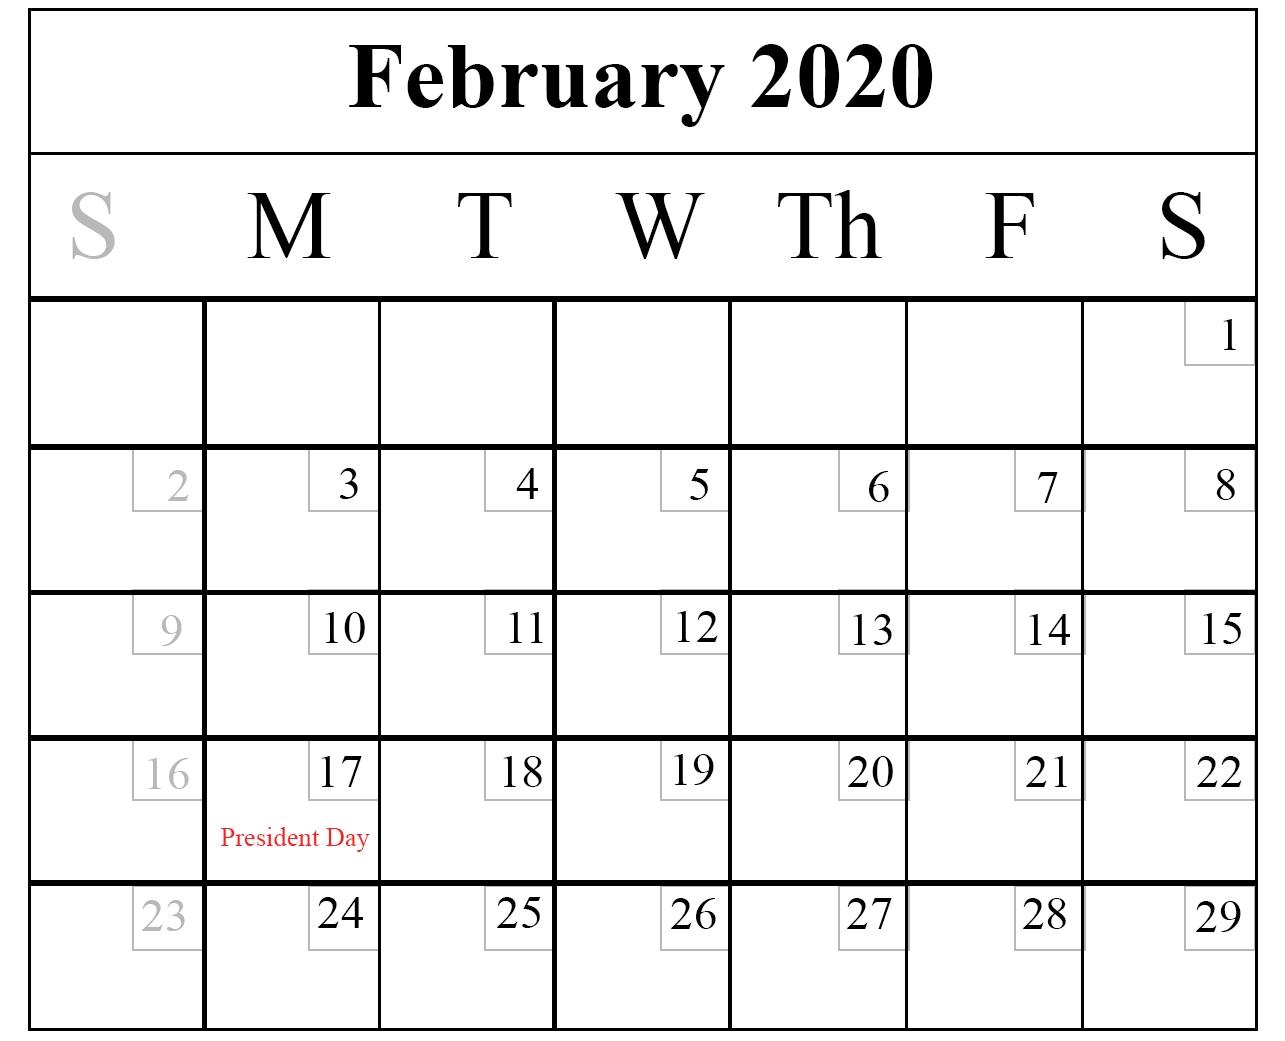 February Calendar 2020 Free Printable Template Pdf Word  Calendar 2020 Free Printable